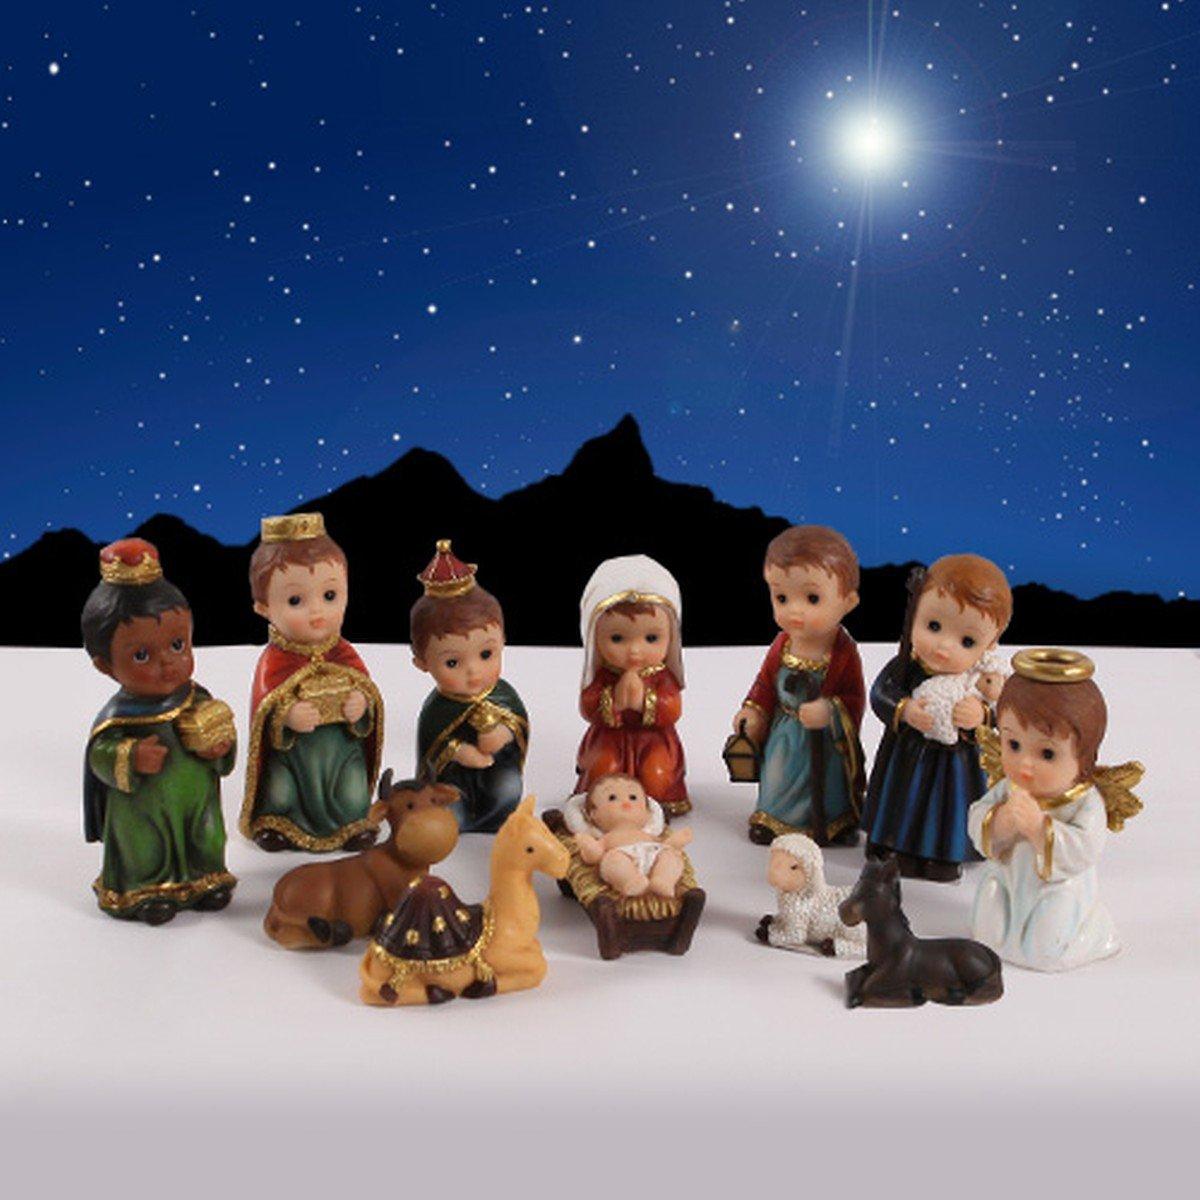 ''O Holy Night'' 12 Pieces Children's Nativity Set